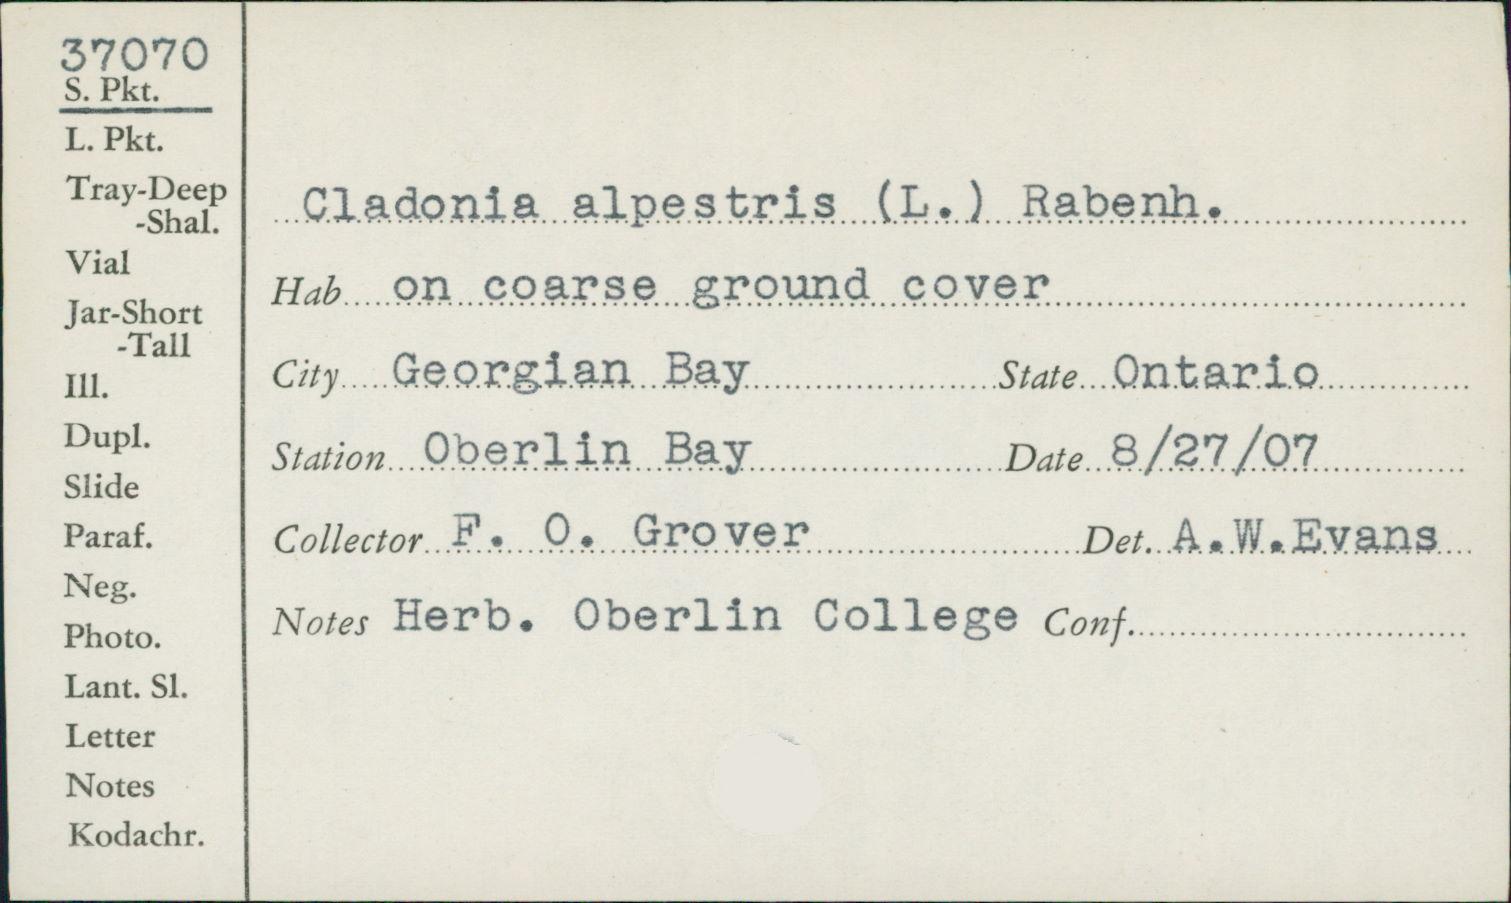 Cladonia alpestris image